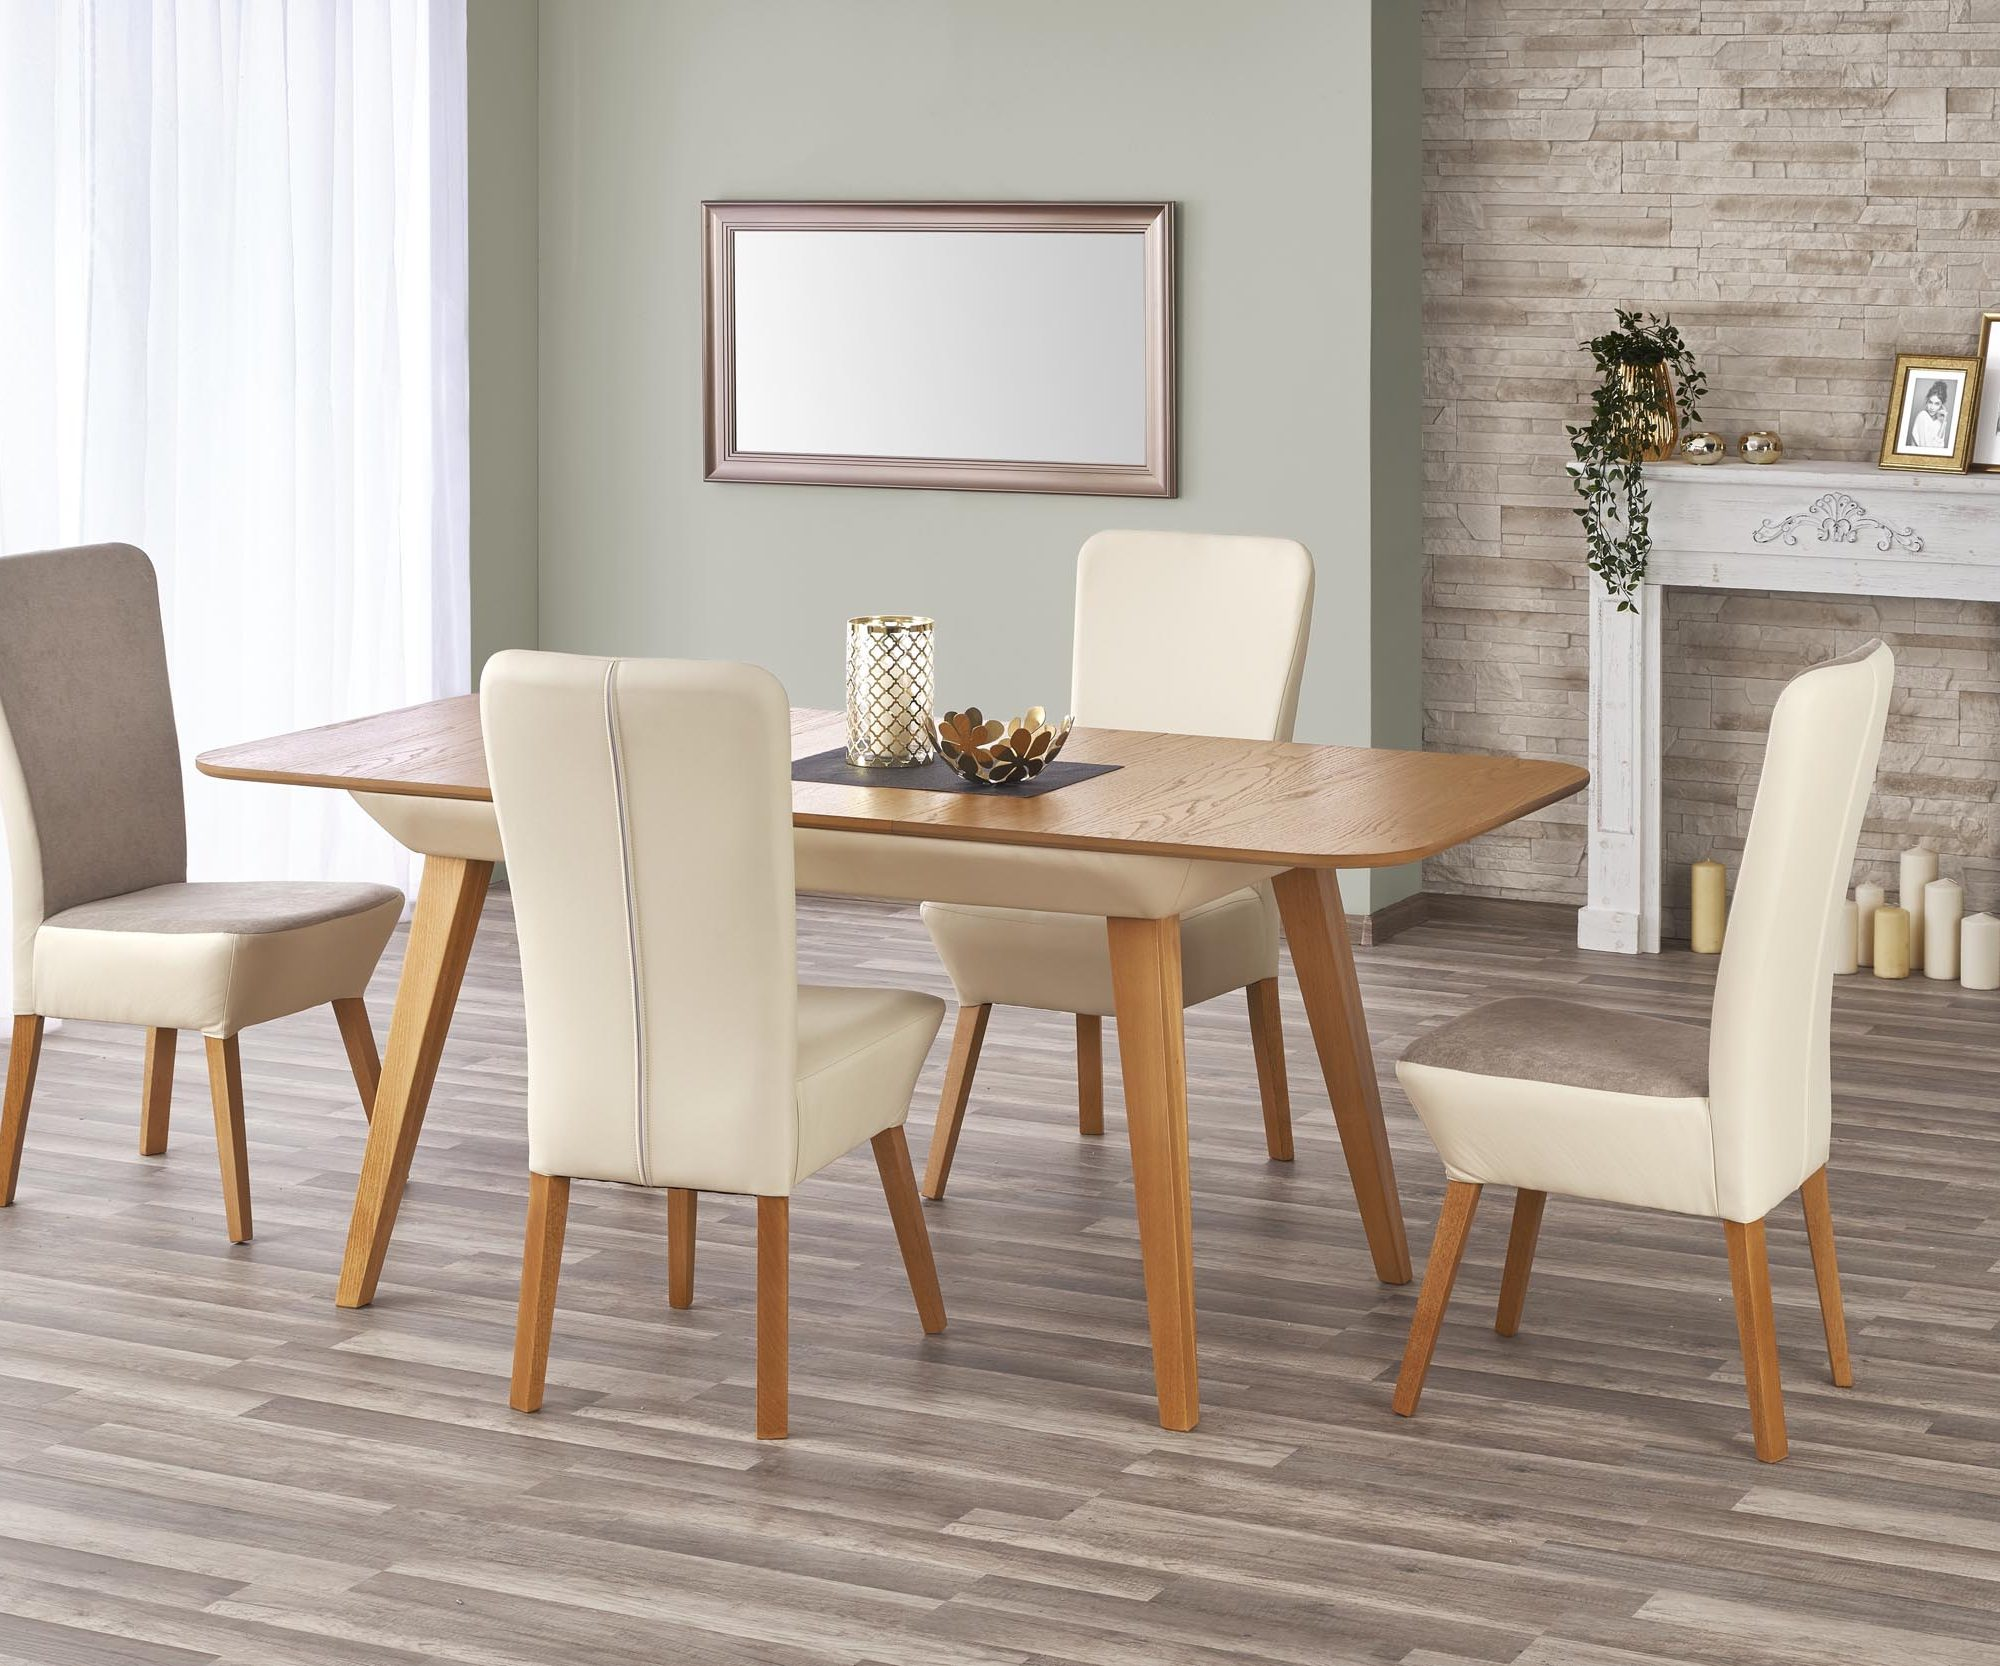 Jedálenský stôl Orchid (pre 6 až 8 osôb)